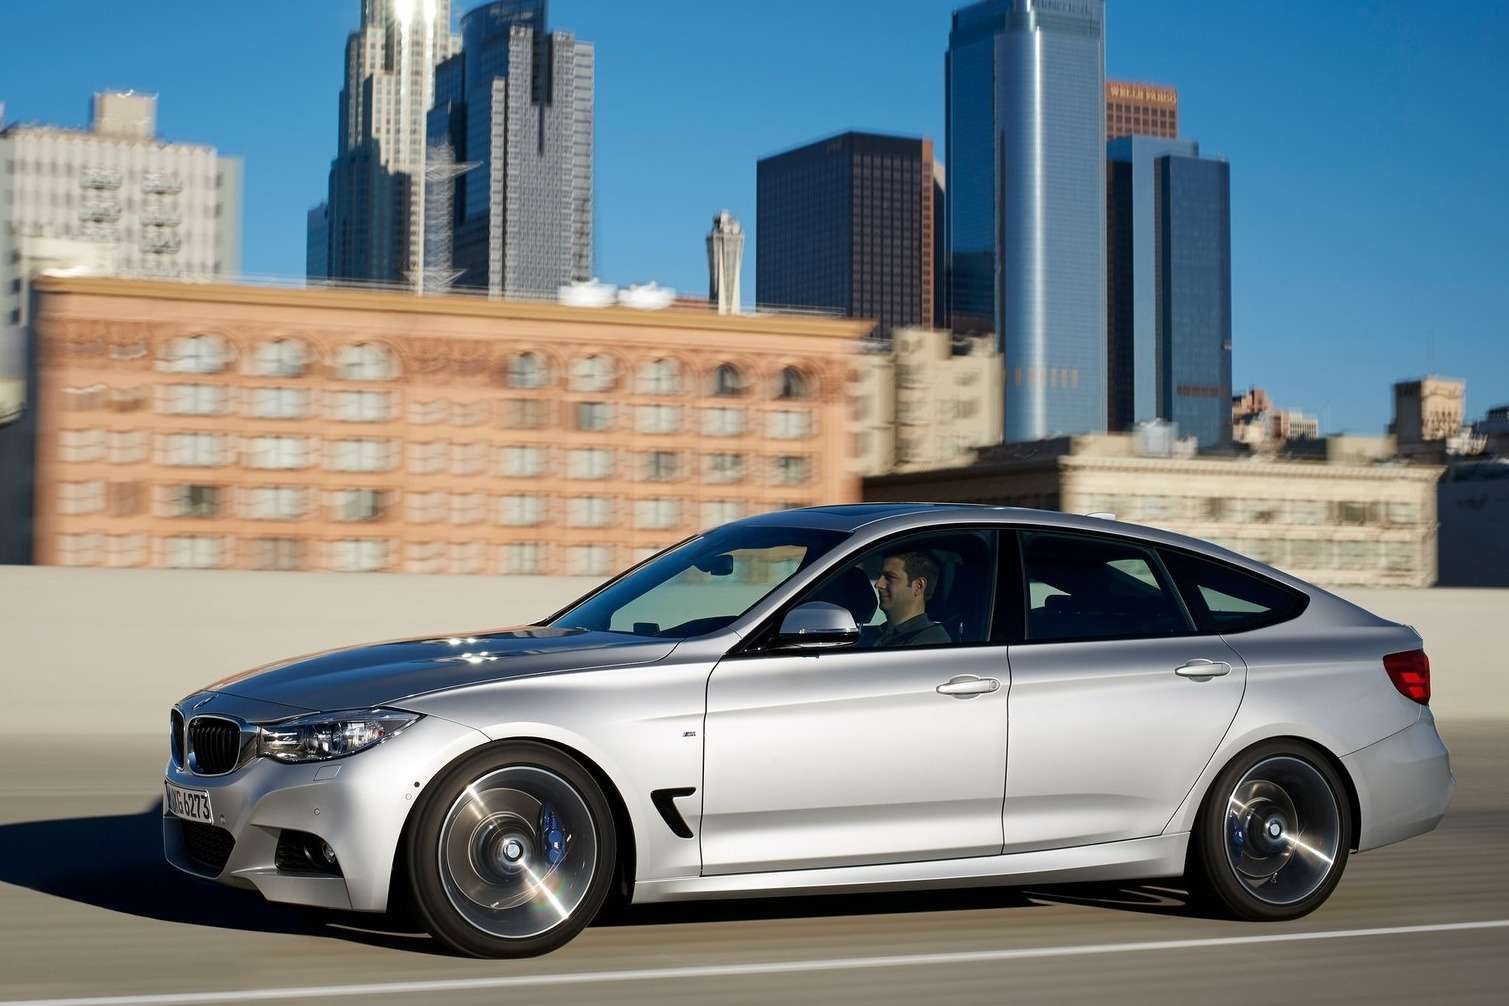 BMW-3-Series_Gran_Turismo_2014_1600x1200_wallpaper_19